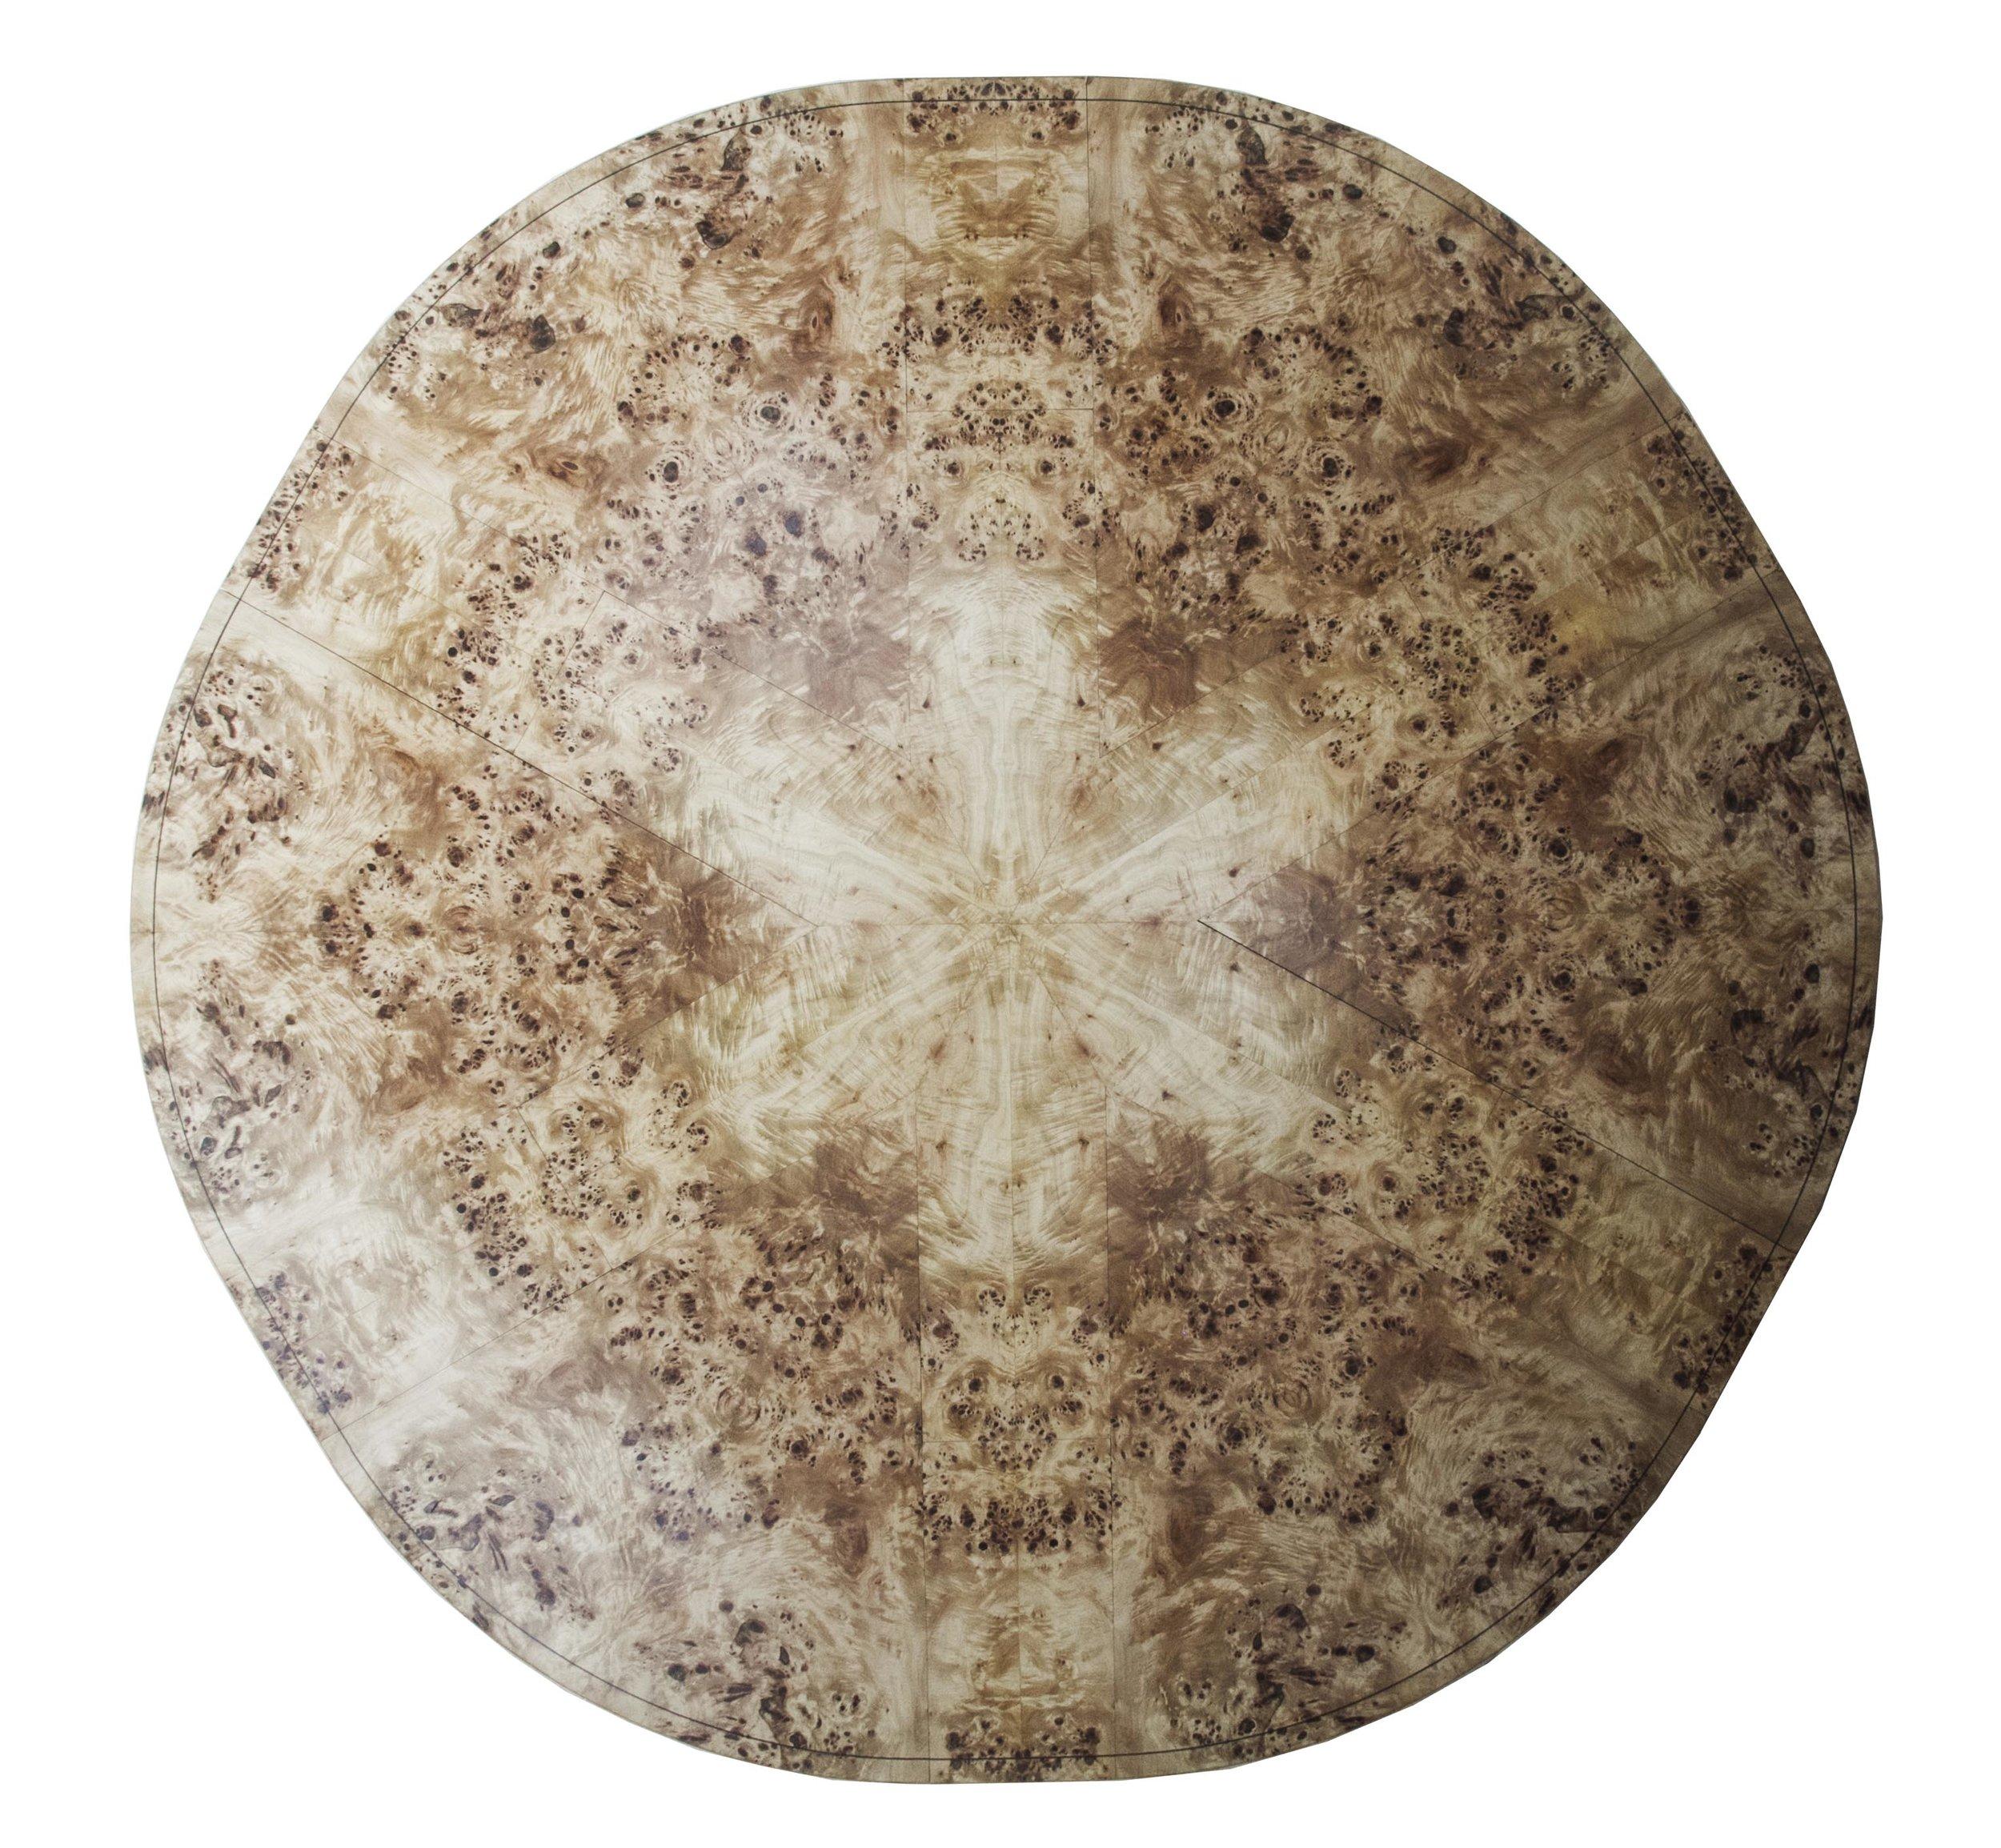 Johnson Furniture - Burr poplar and elm dining table 06.jpg